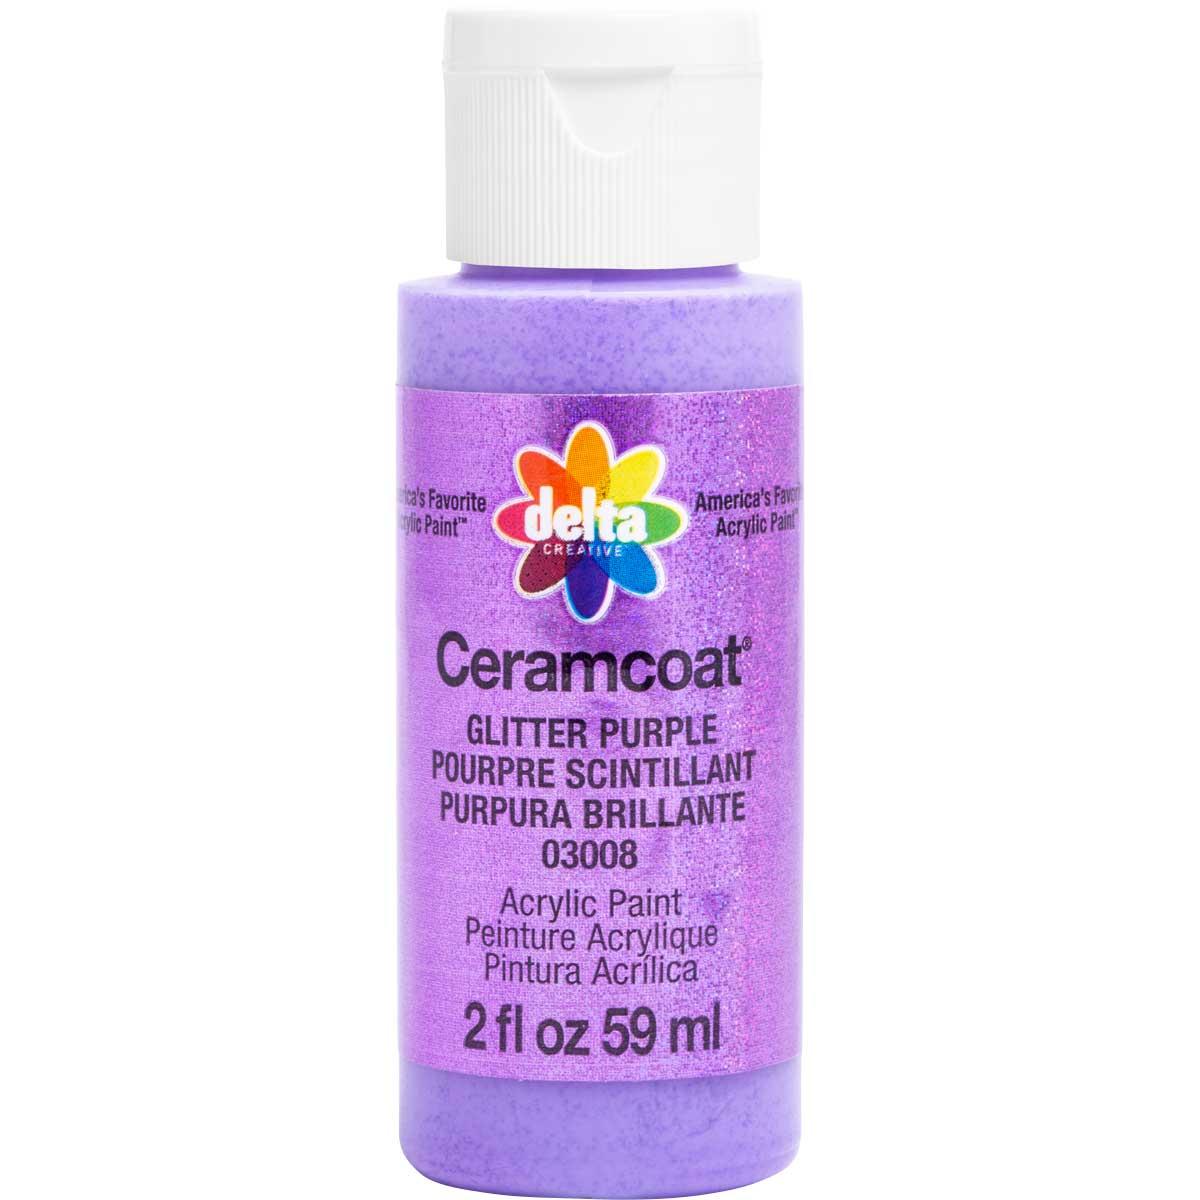 Delta Ceramcoat ® Acrylic Paint - Glitter Purple, 2 oz. - 03008